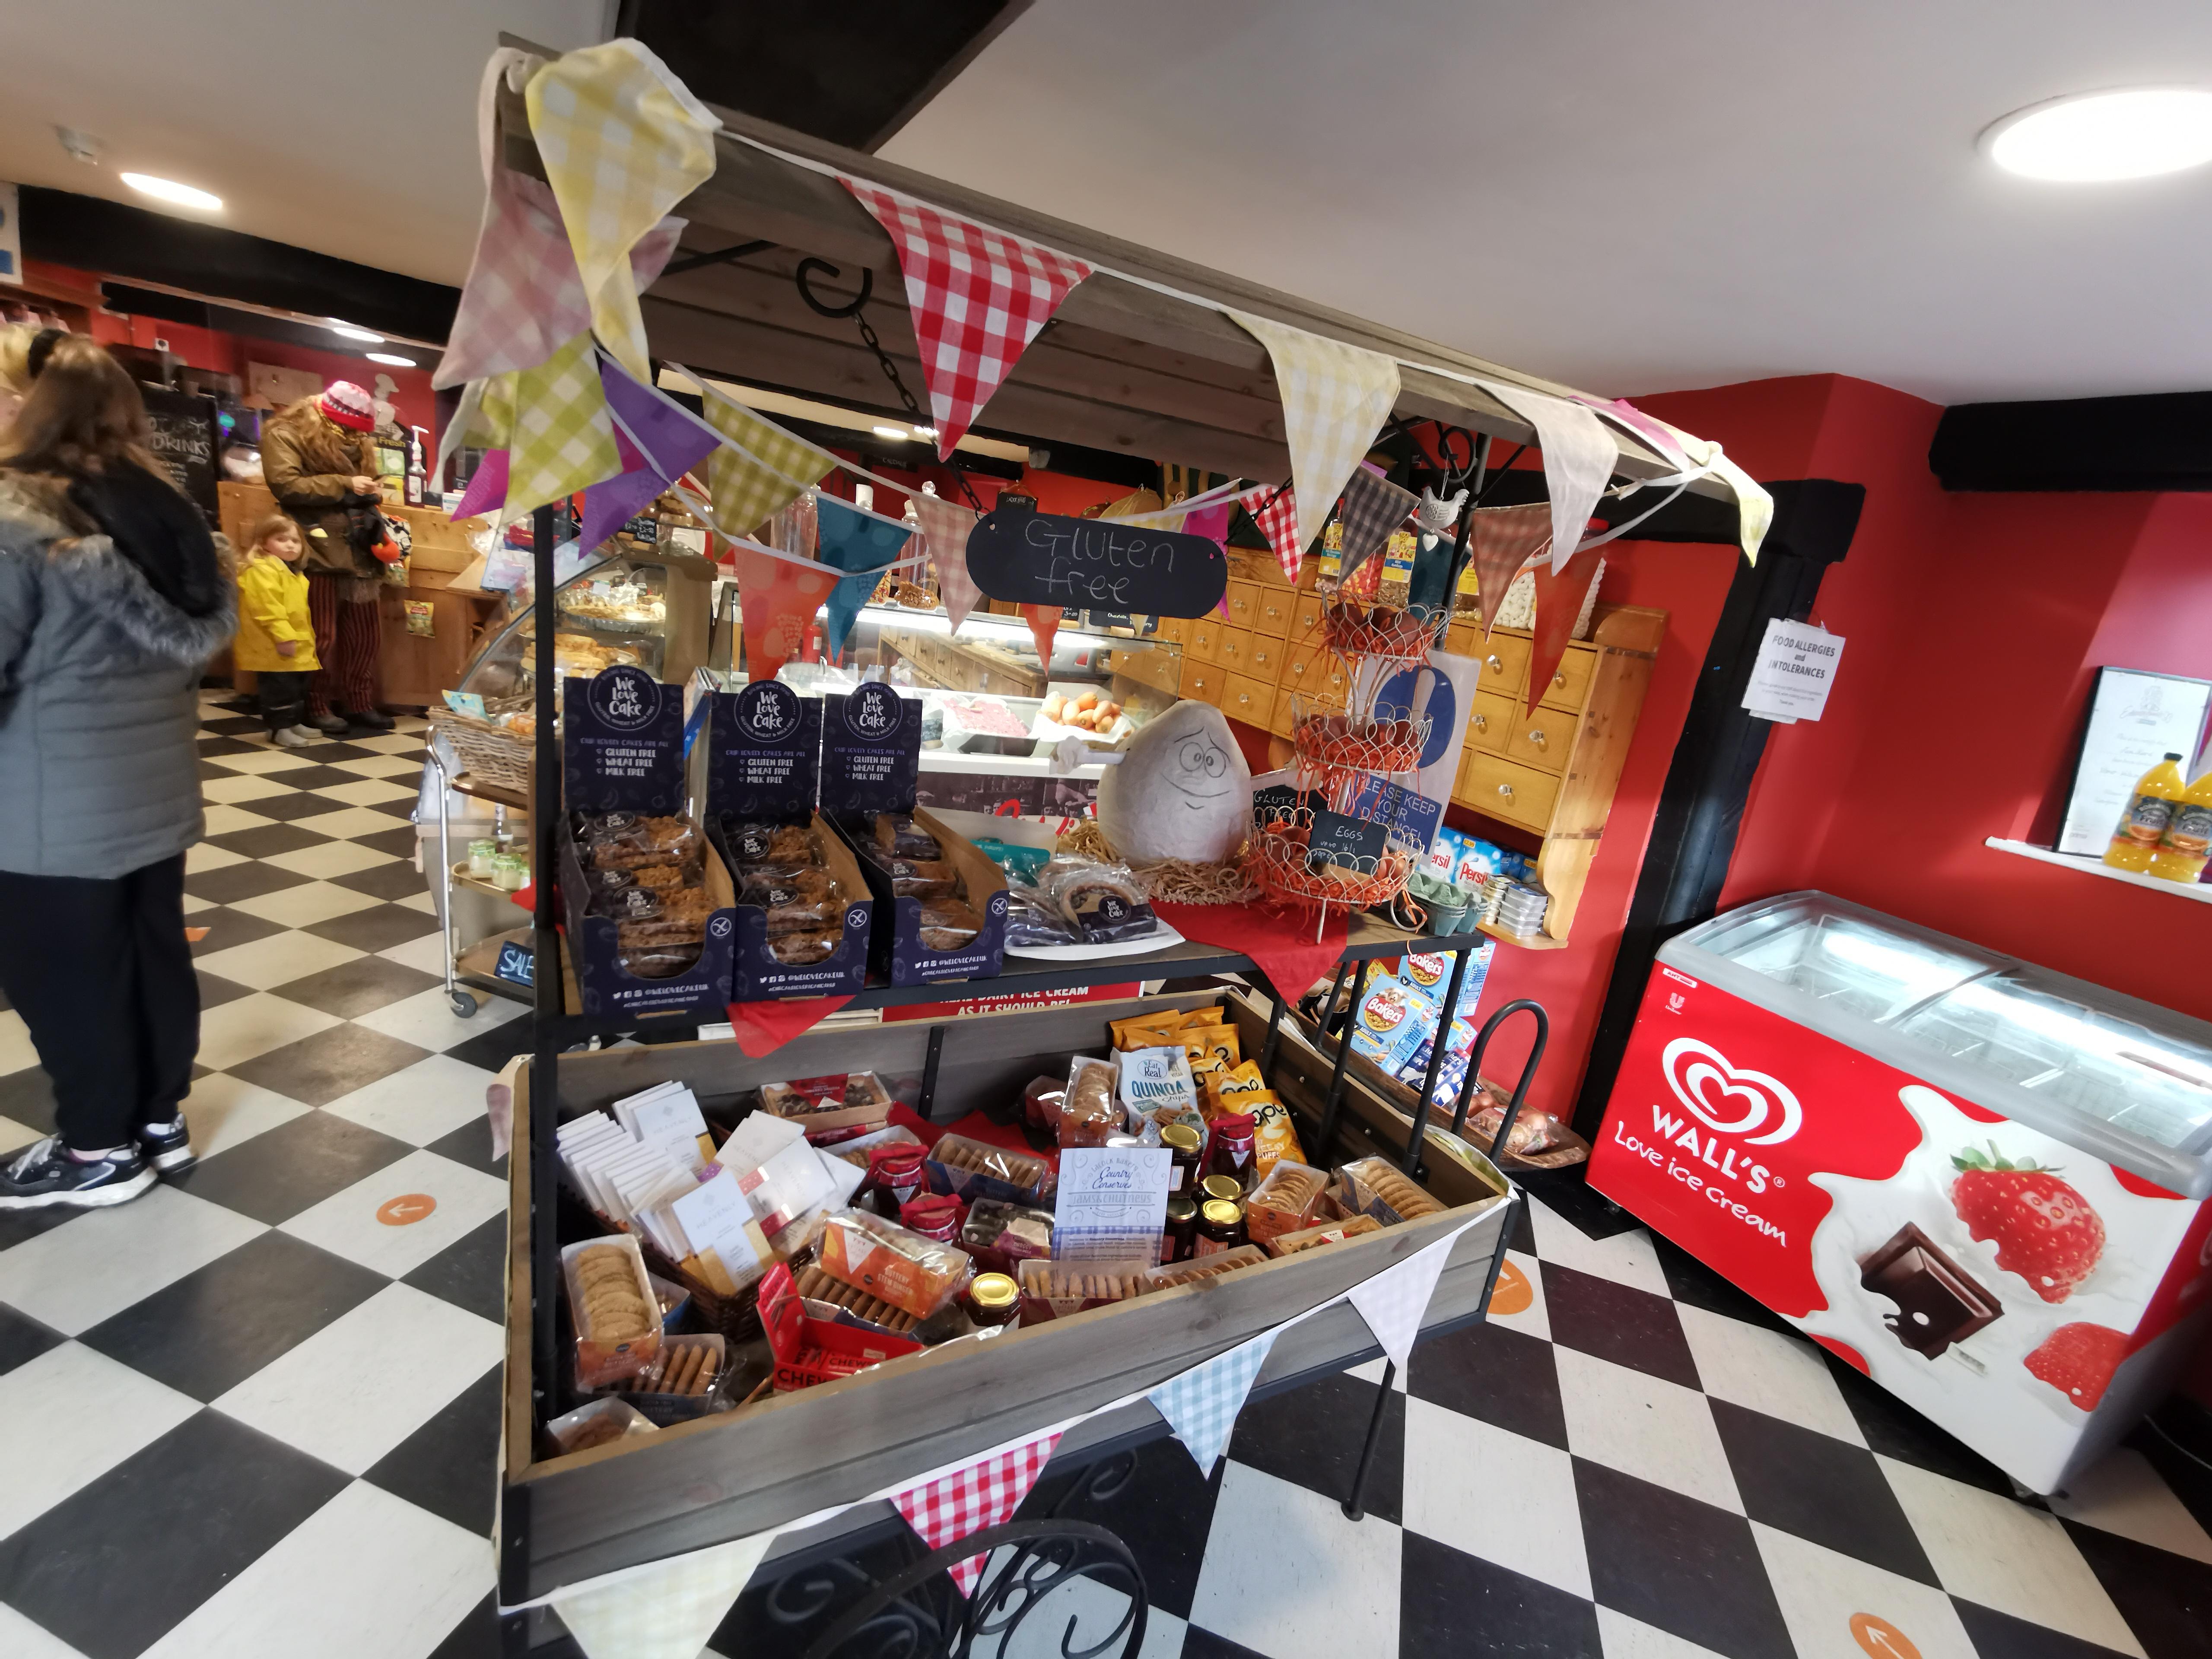 Inside the shop in Lacock village